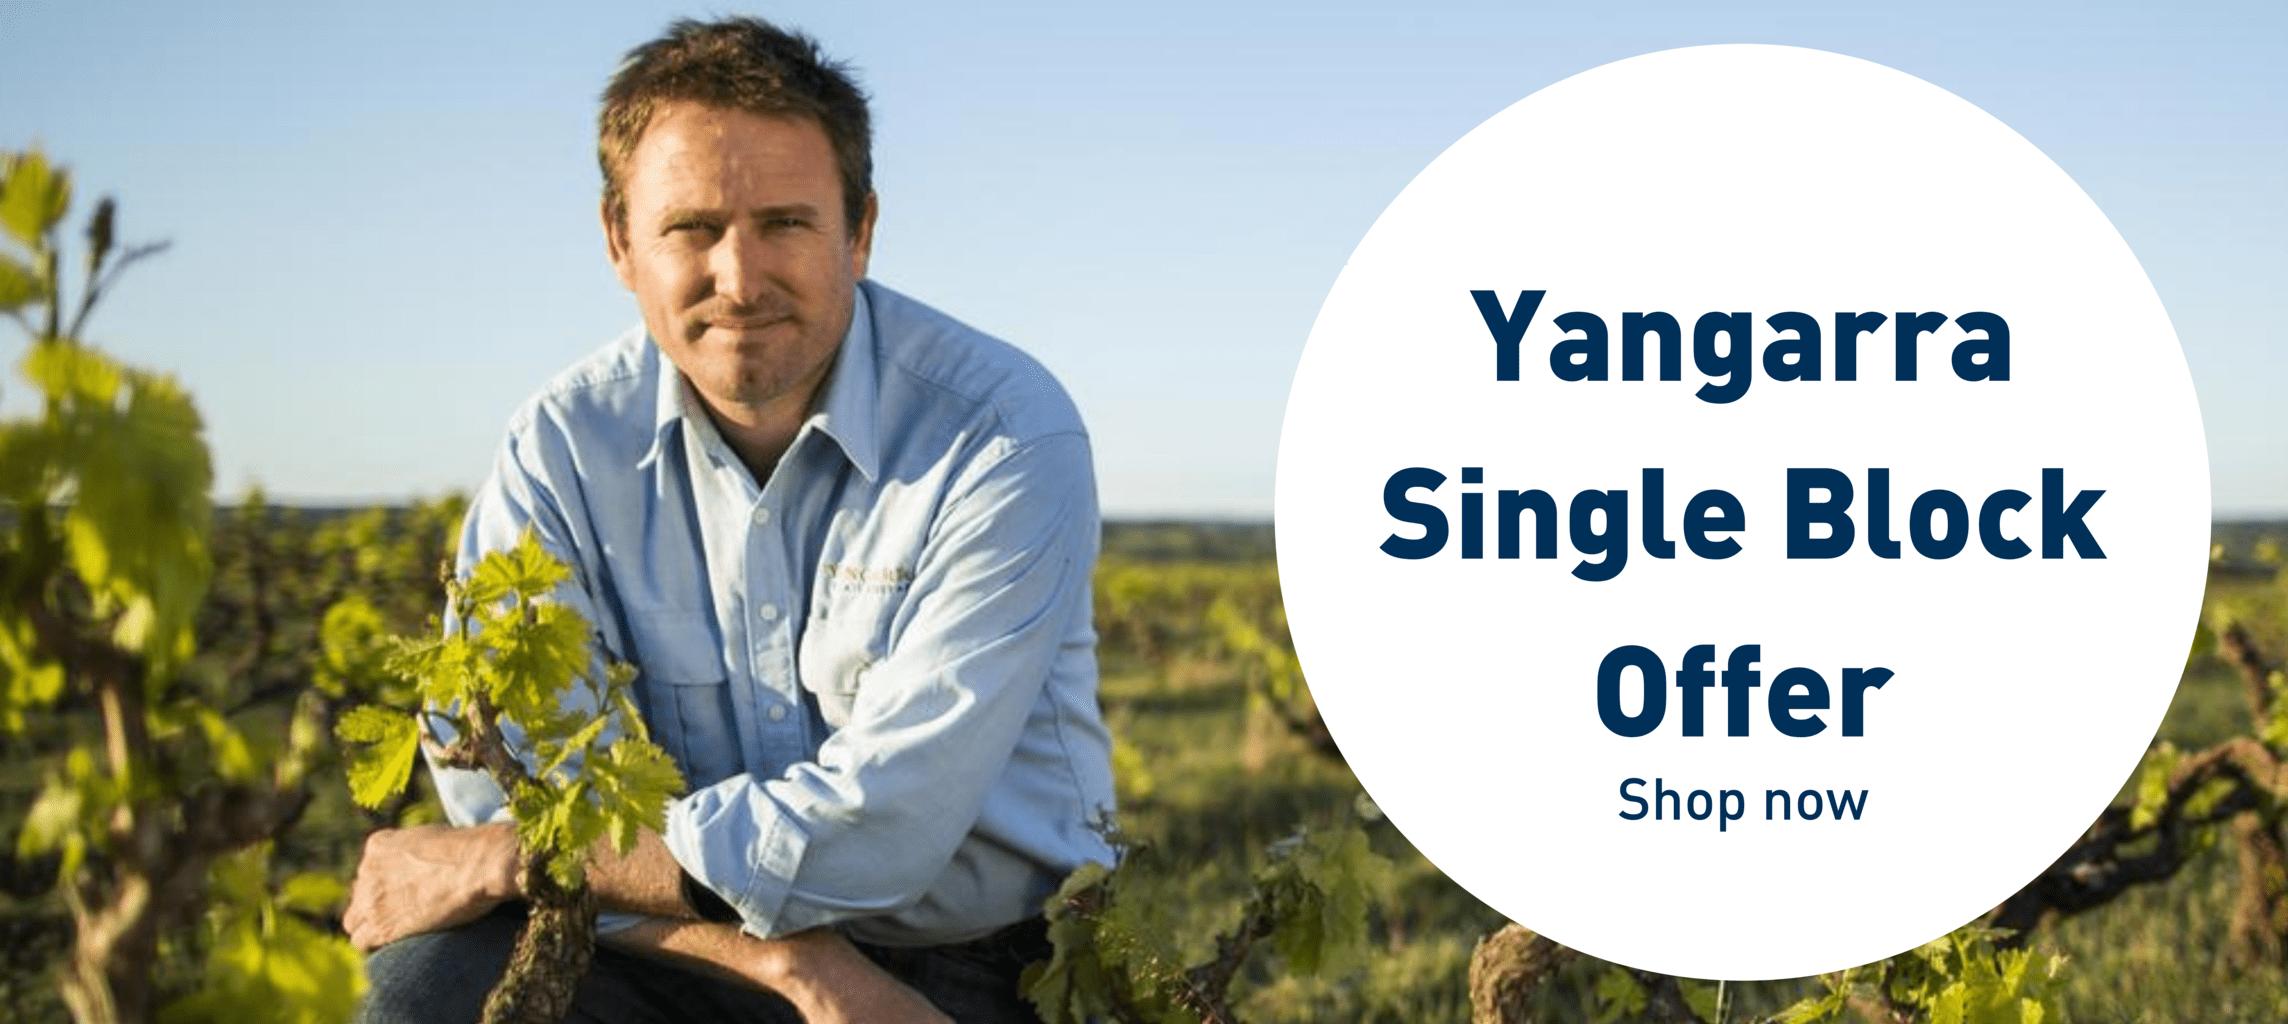 Yangarra Single Block Offer